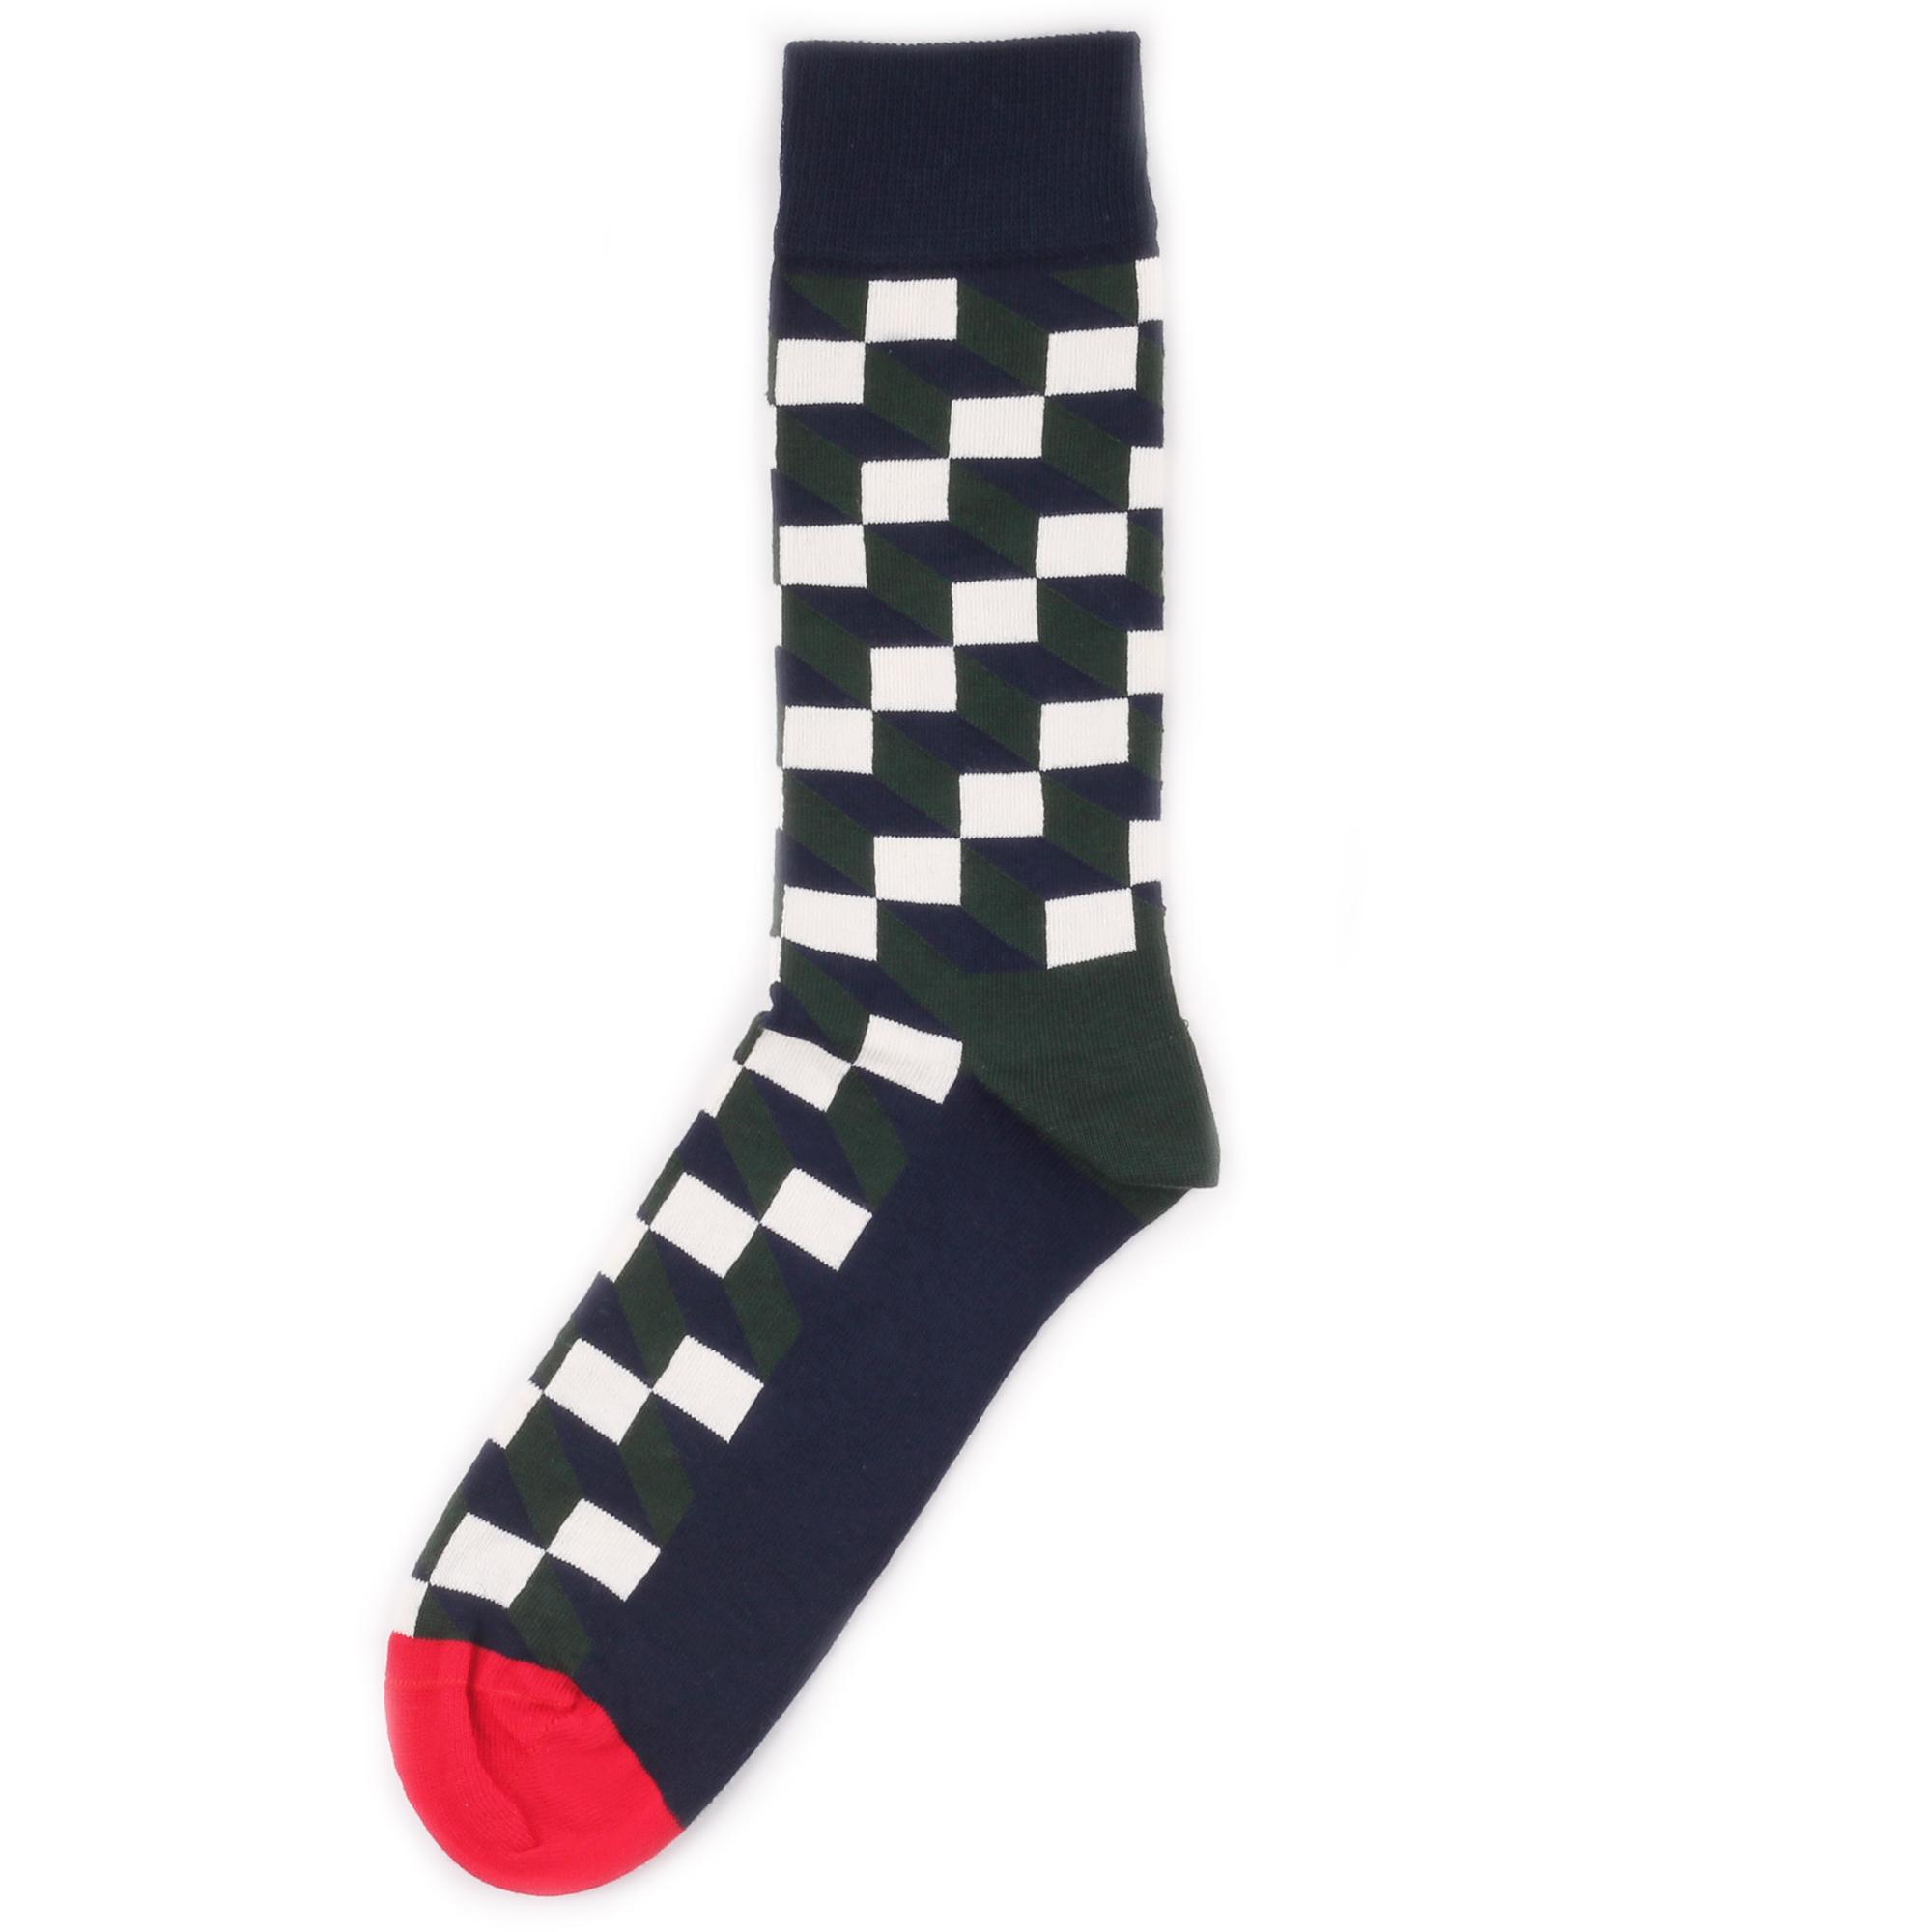 Носки унисекс Happy Socks Happy Socks Filled Optic - Dark Green разноцветные 36-40